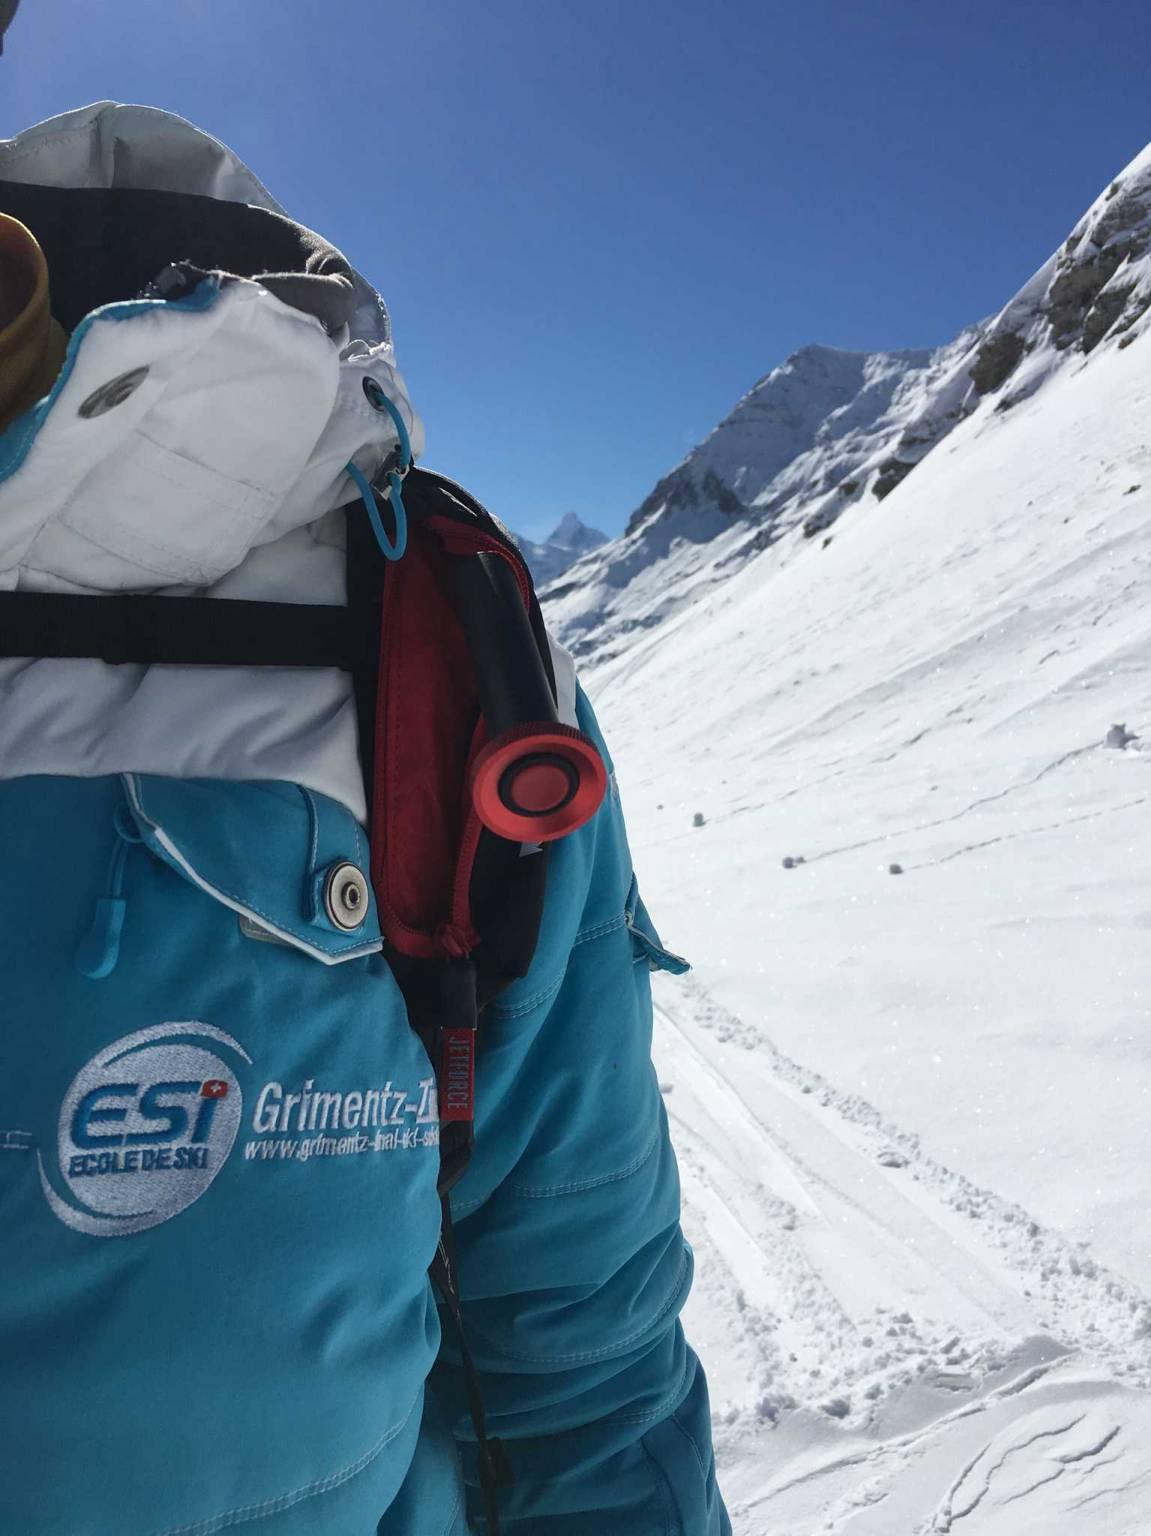 moniteurs de ski saison 2019-2020